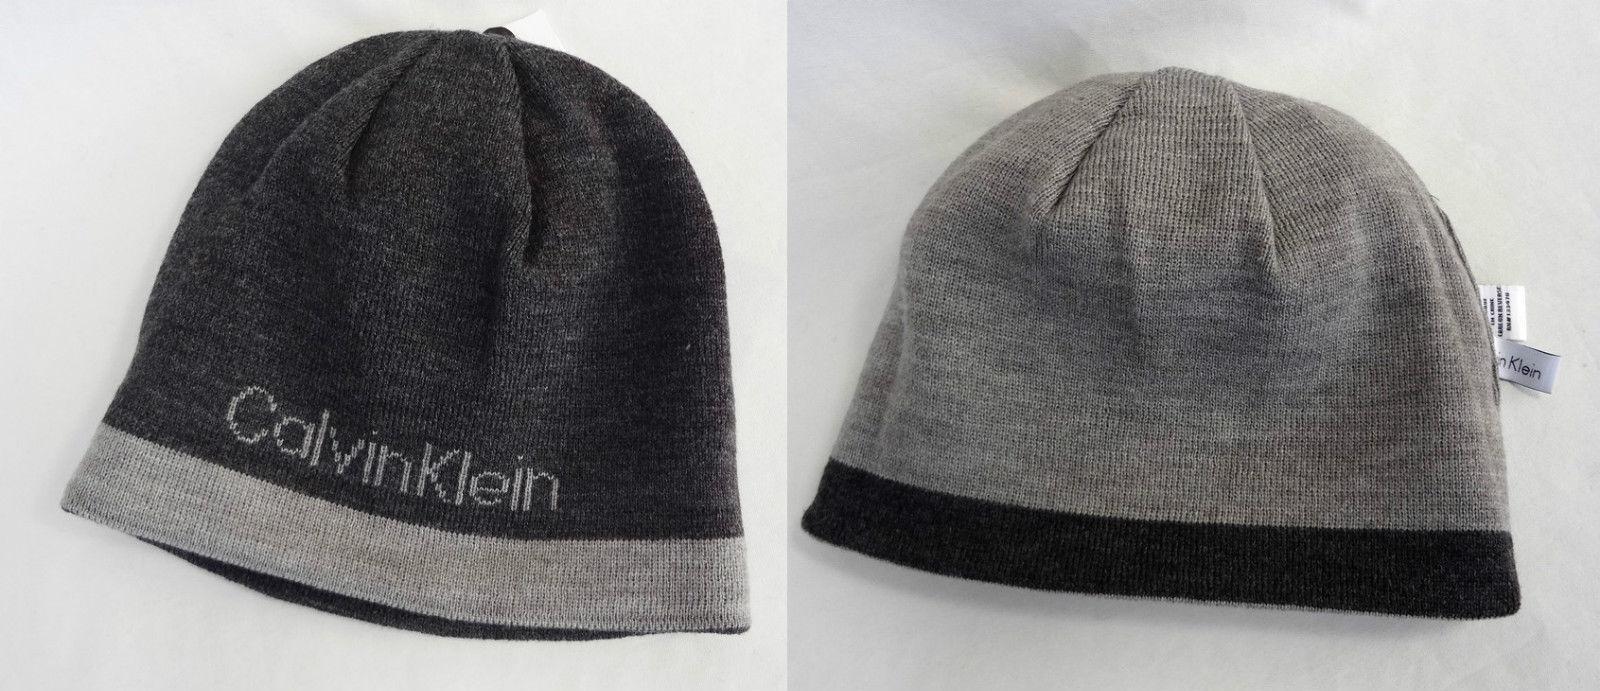 d159f34ae3e Calvin Klein Men s REVERSIBLE Beanie  77235 and 50 similar items